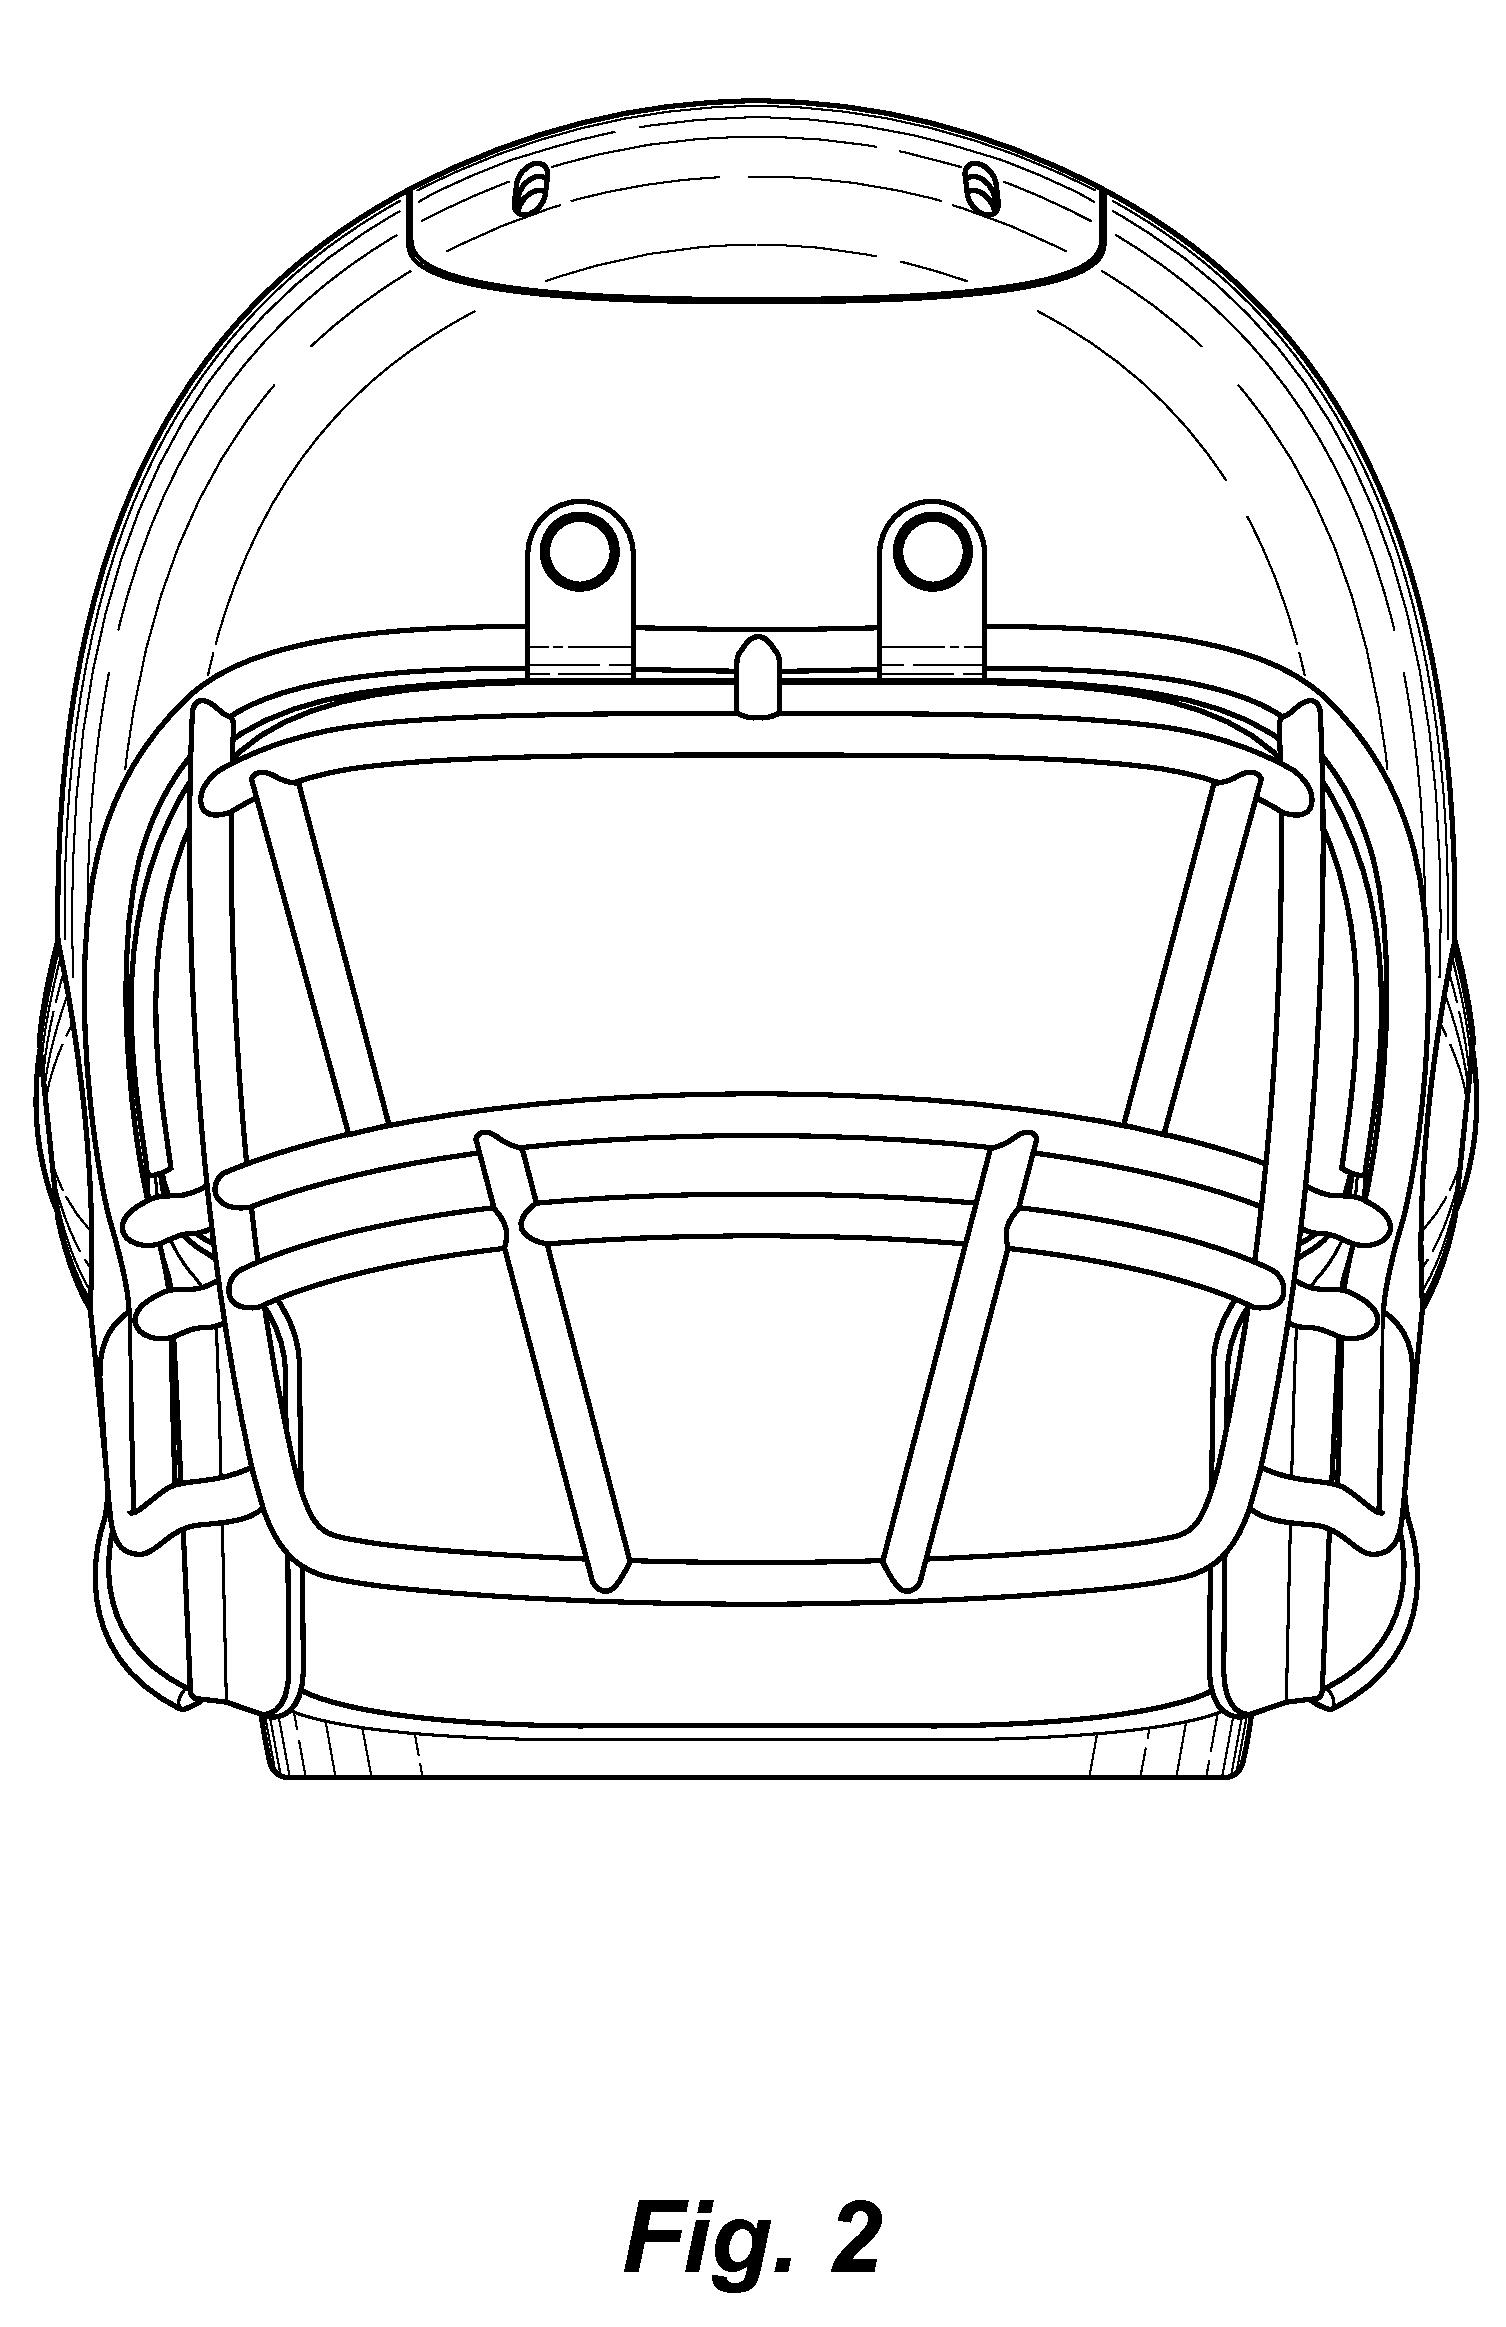 Football Helmet Front View : Patent usd football helmet coffee maker google